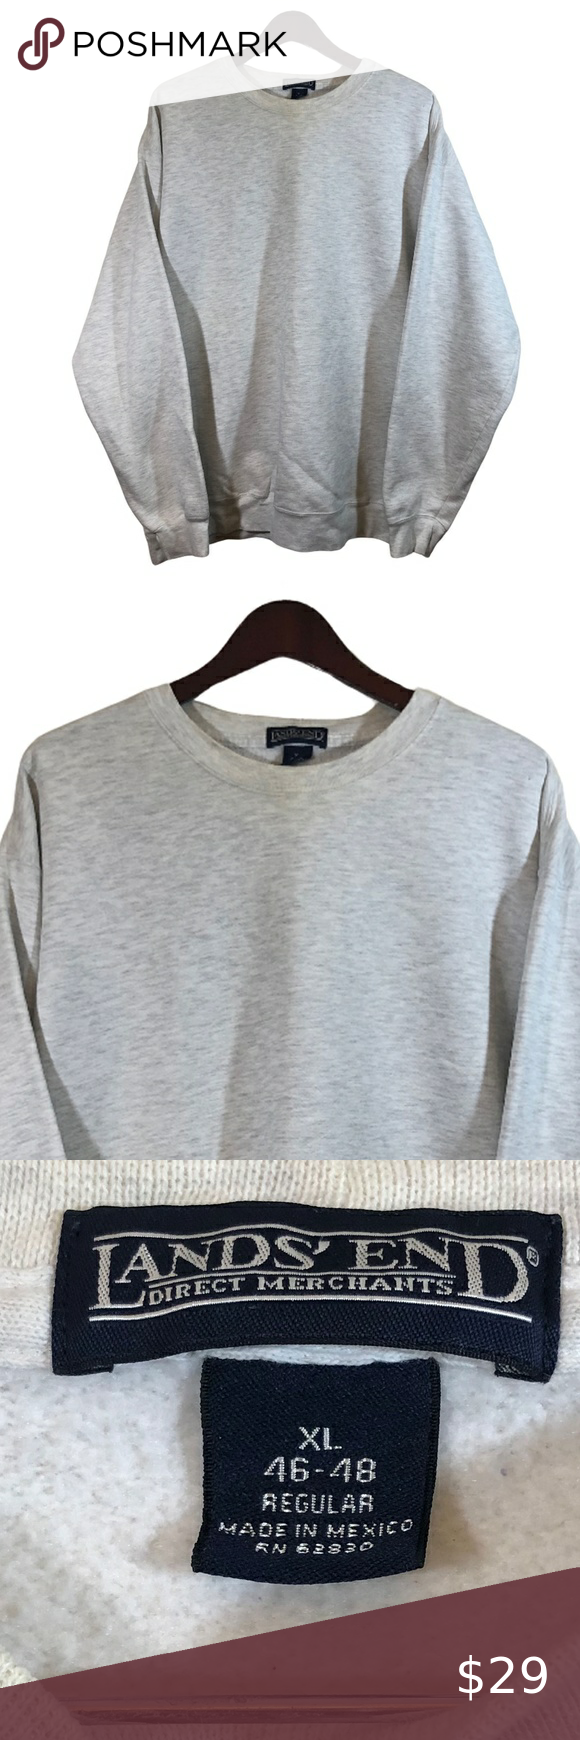 Lands End Gray White Crewneck Sweatshirt Size Xl White Crewneck Sweatshirt Crew Neck Sweatshirt Sweatshirts [ 1740 x 580 Pixel ]